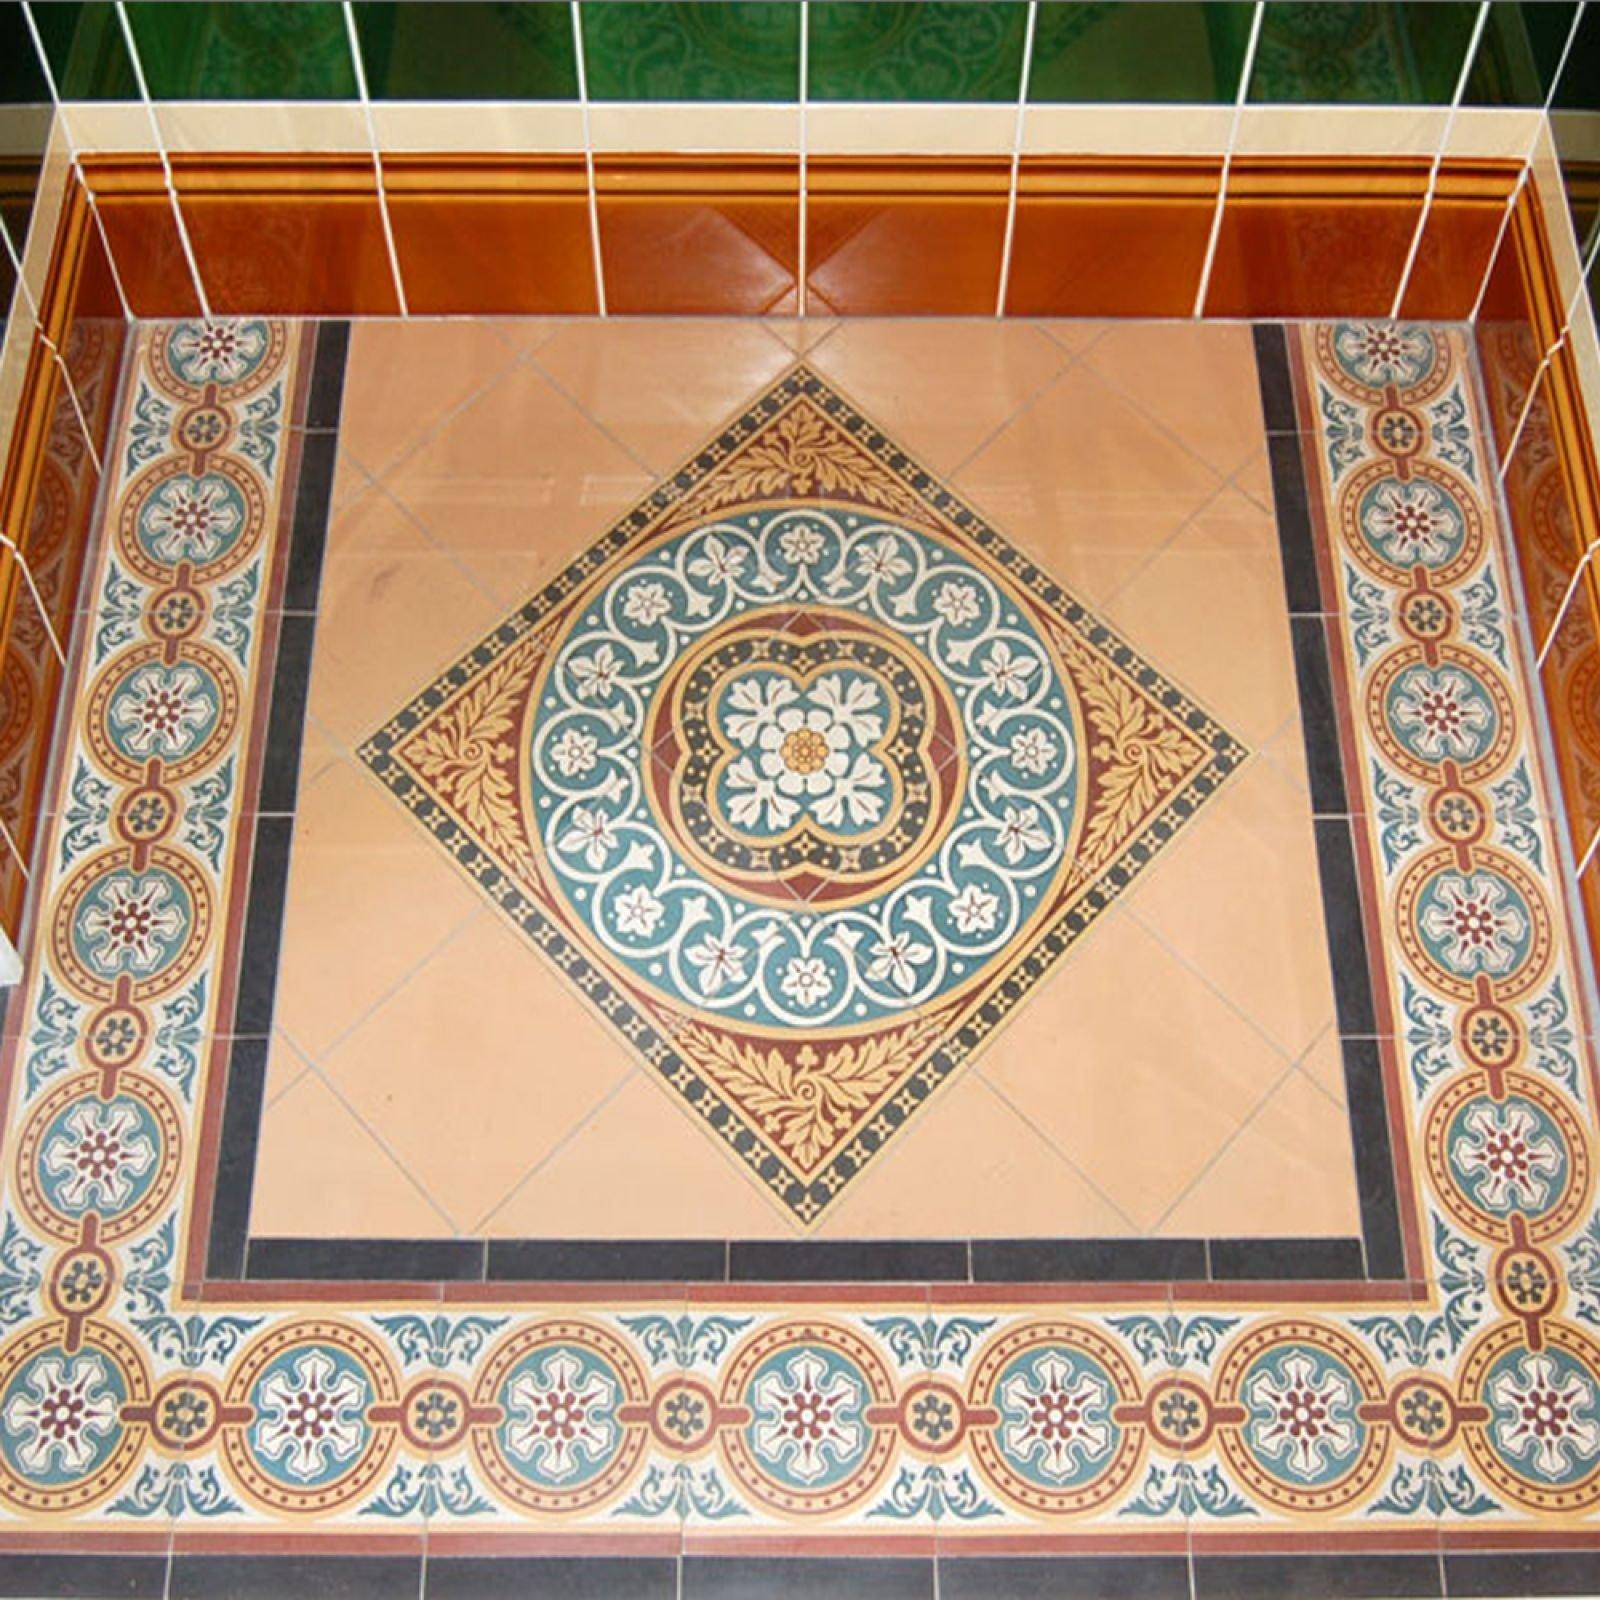 Jacks Field Mosaic Floor tiles Inset (centre) - Victorian ...